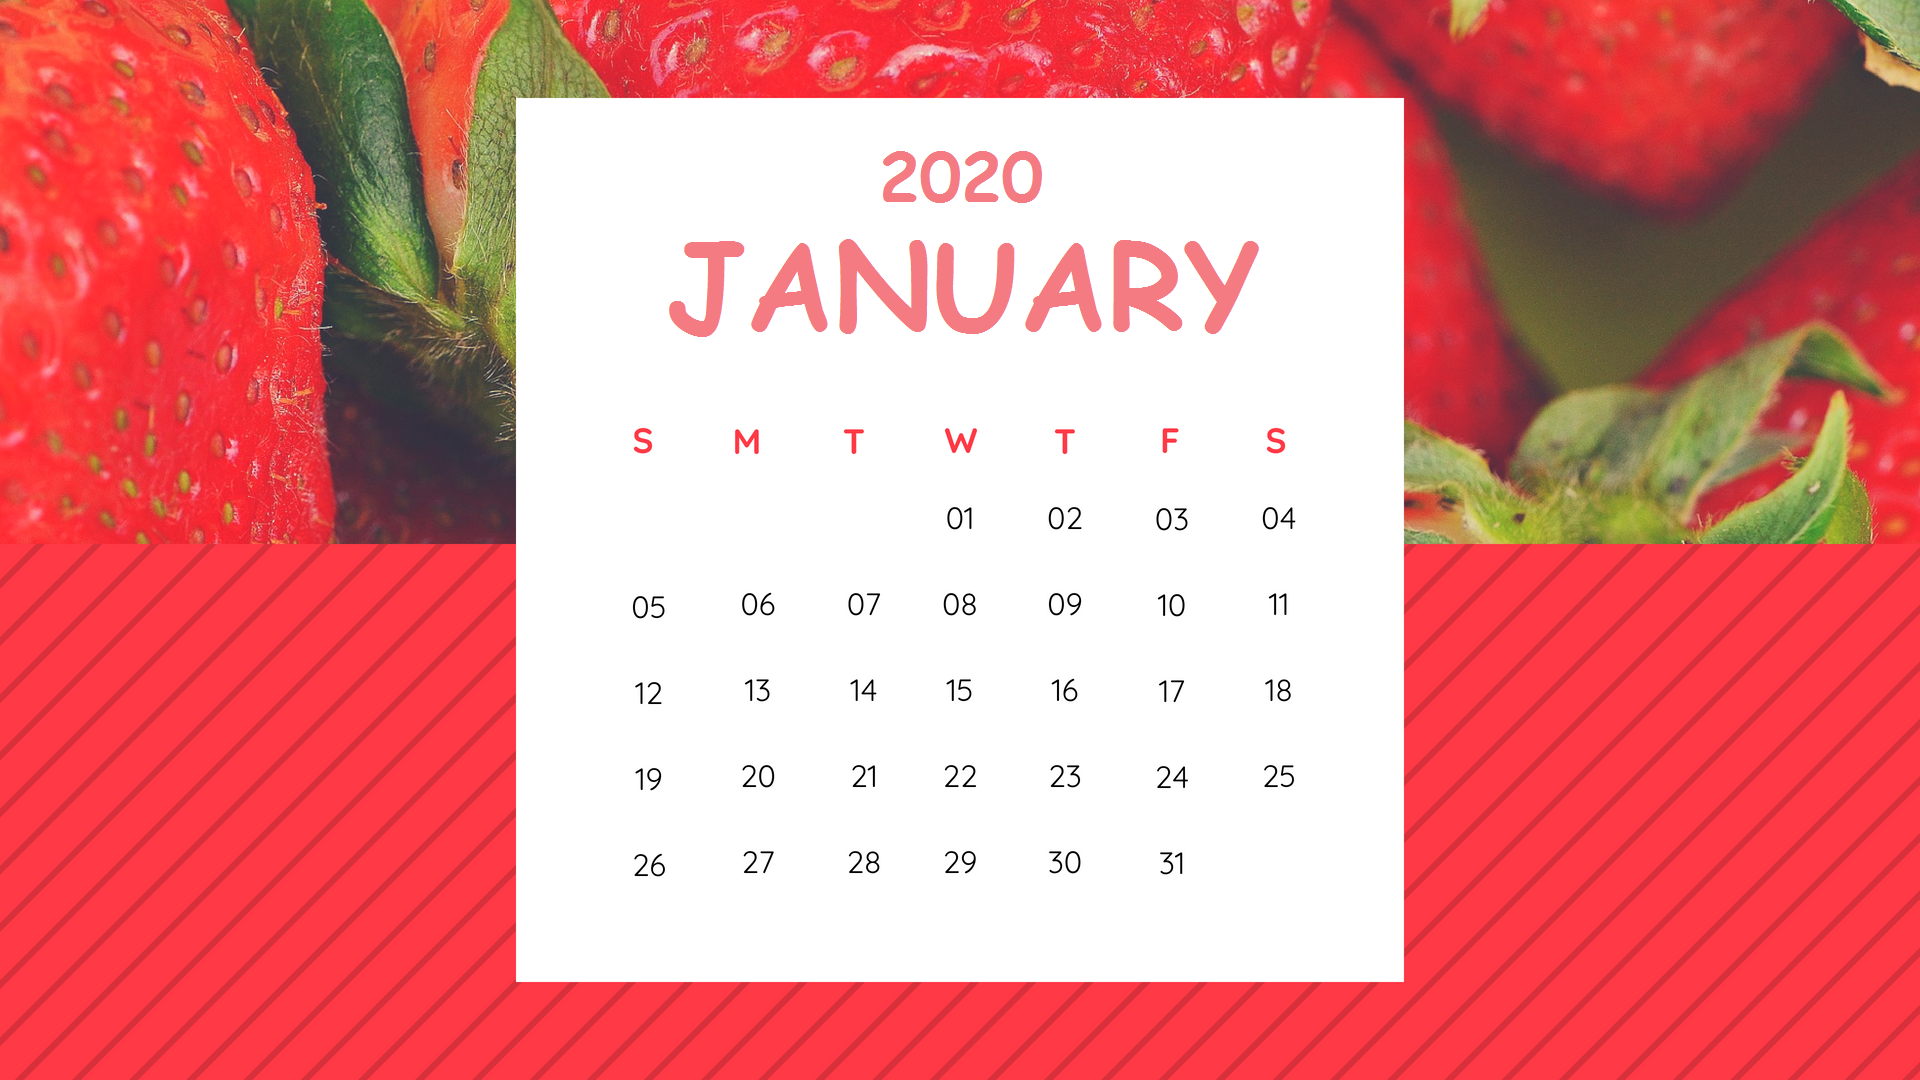 January 2020 Calendar Wallpaper